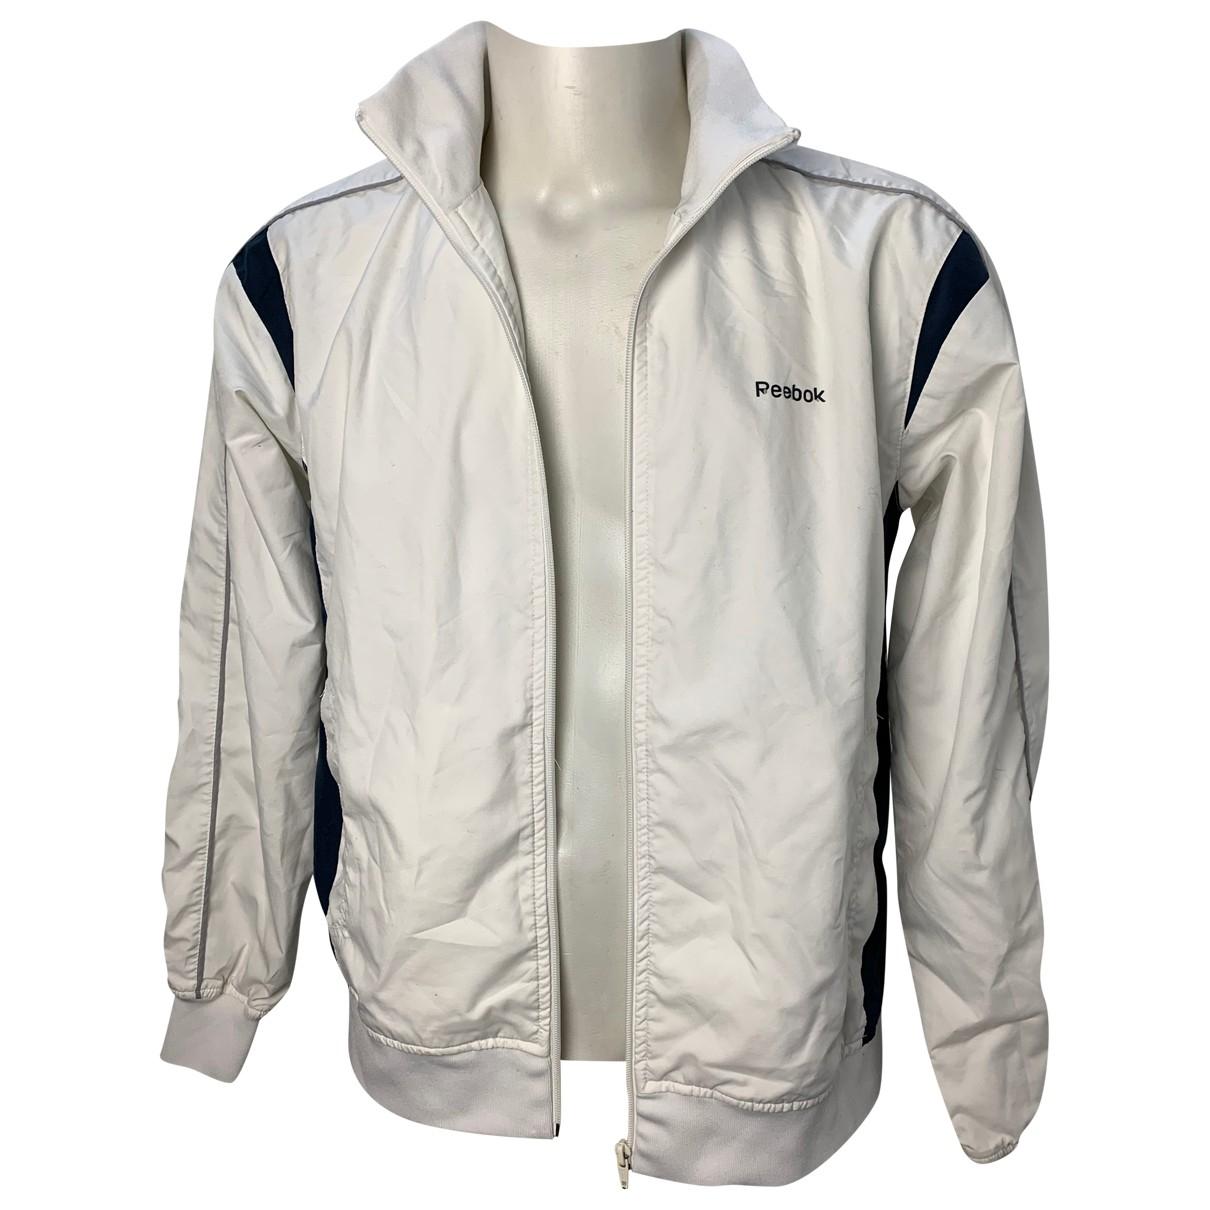 Reebok \N White Suits for Men M International